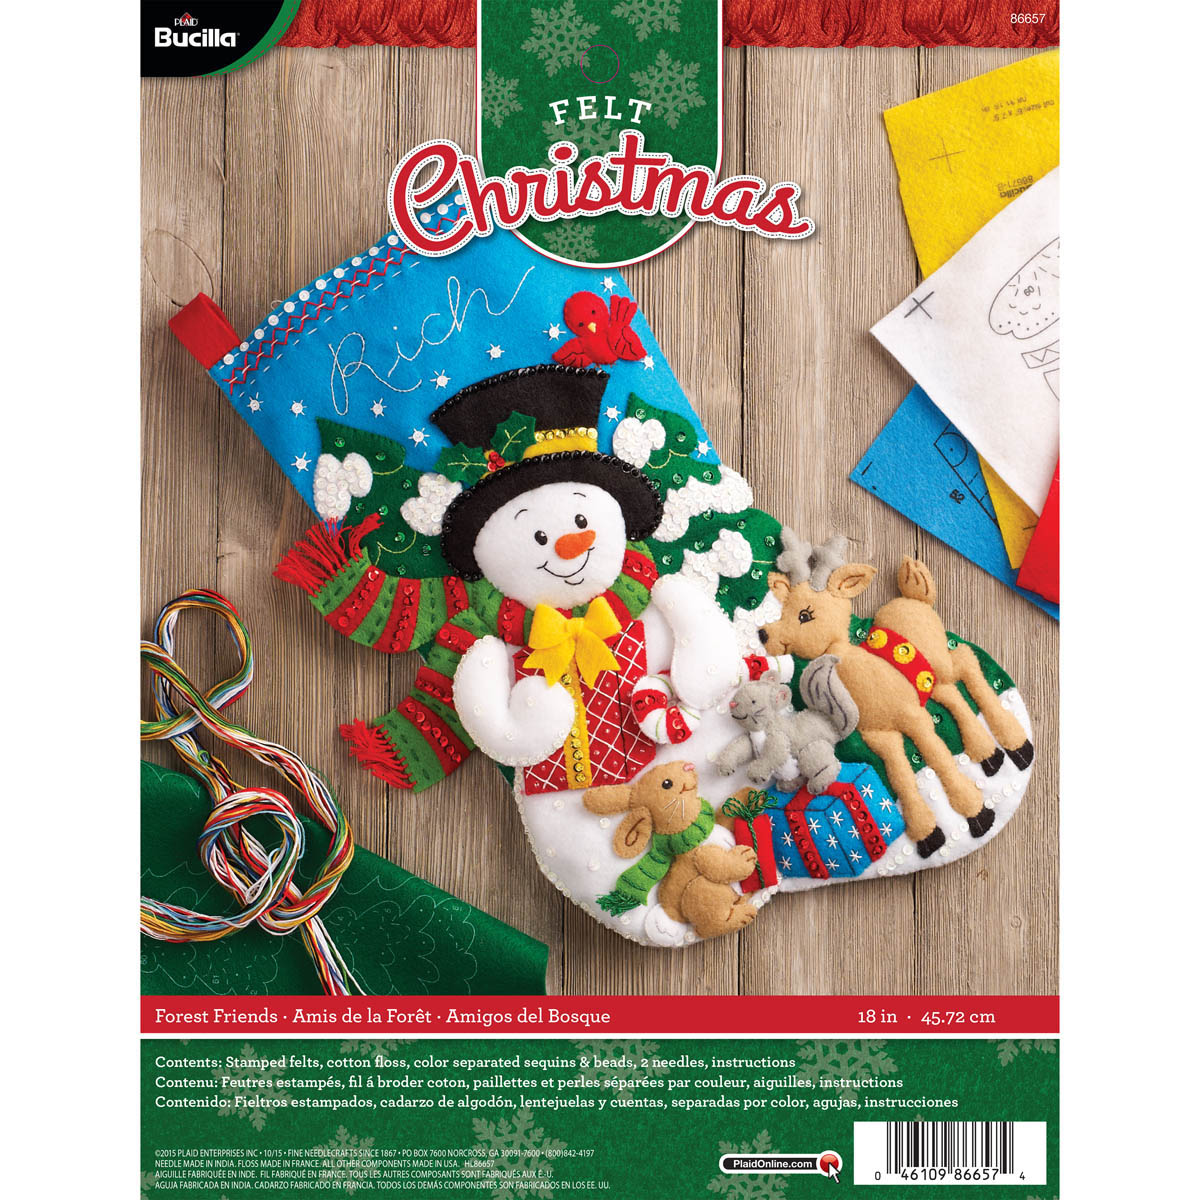 Bucilla ® Seasonal - Felt - Stocking Kits - Forest Friends - 86657